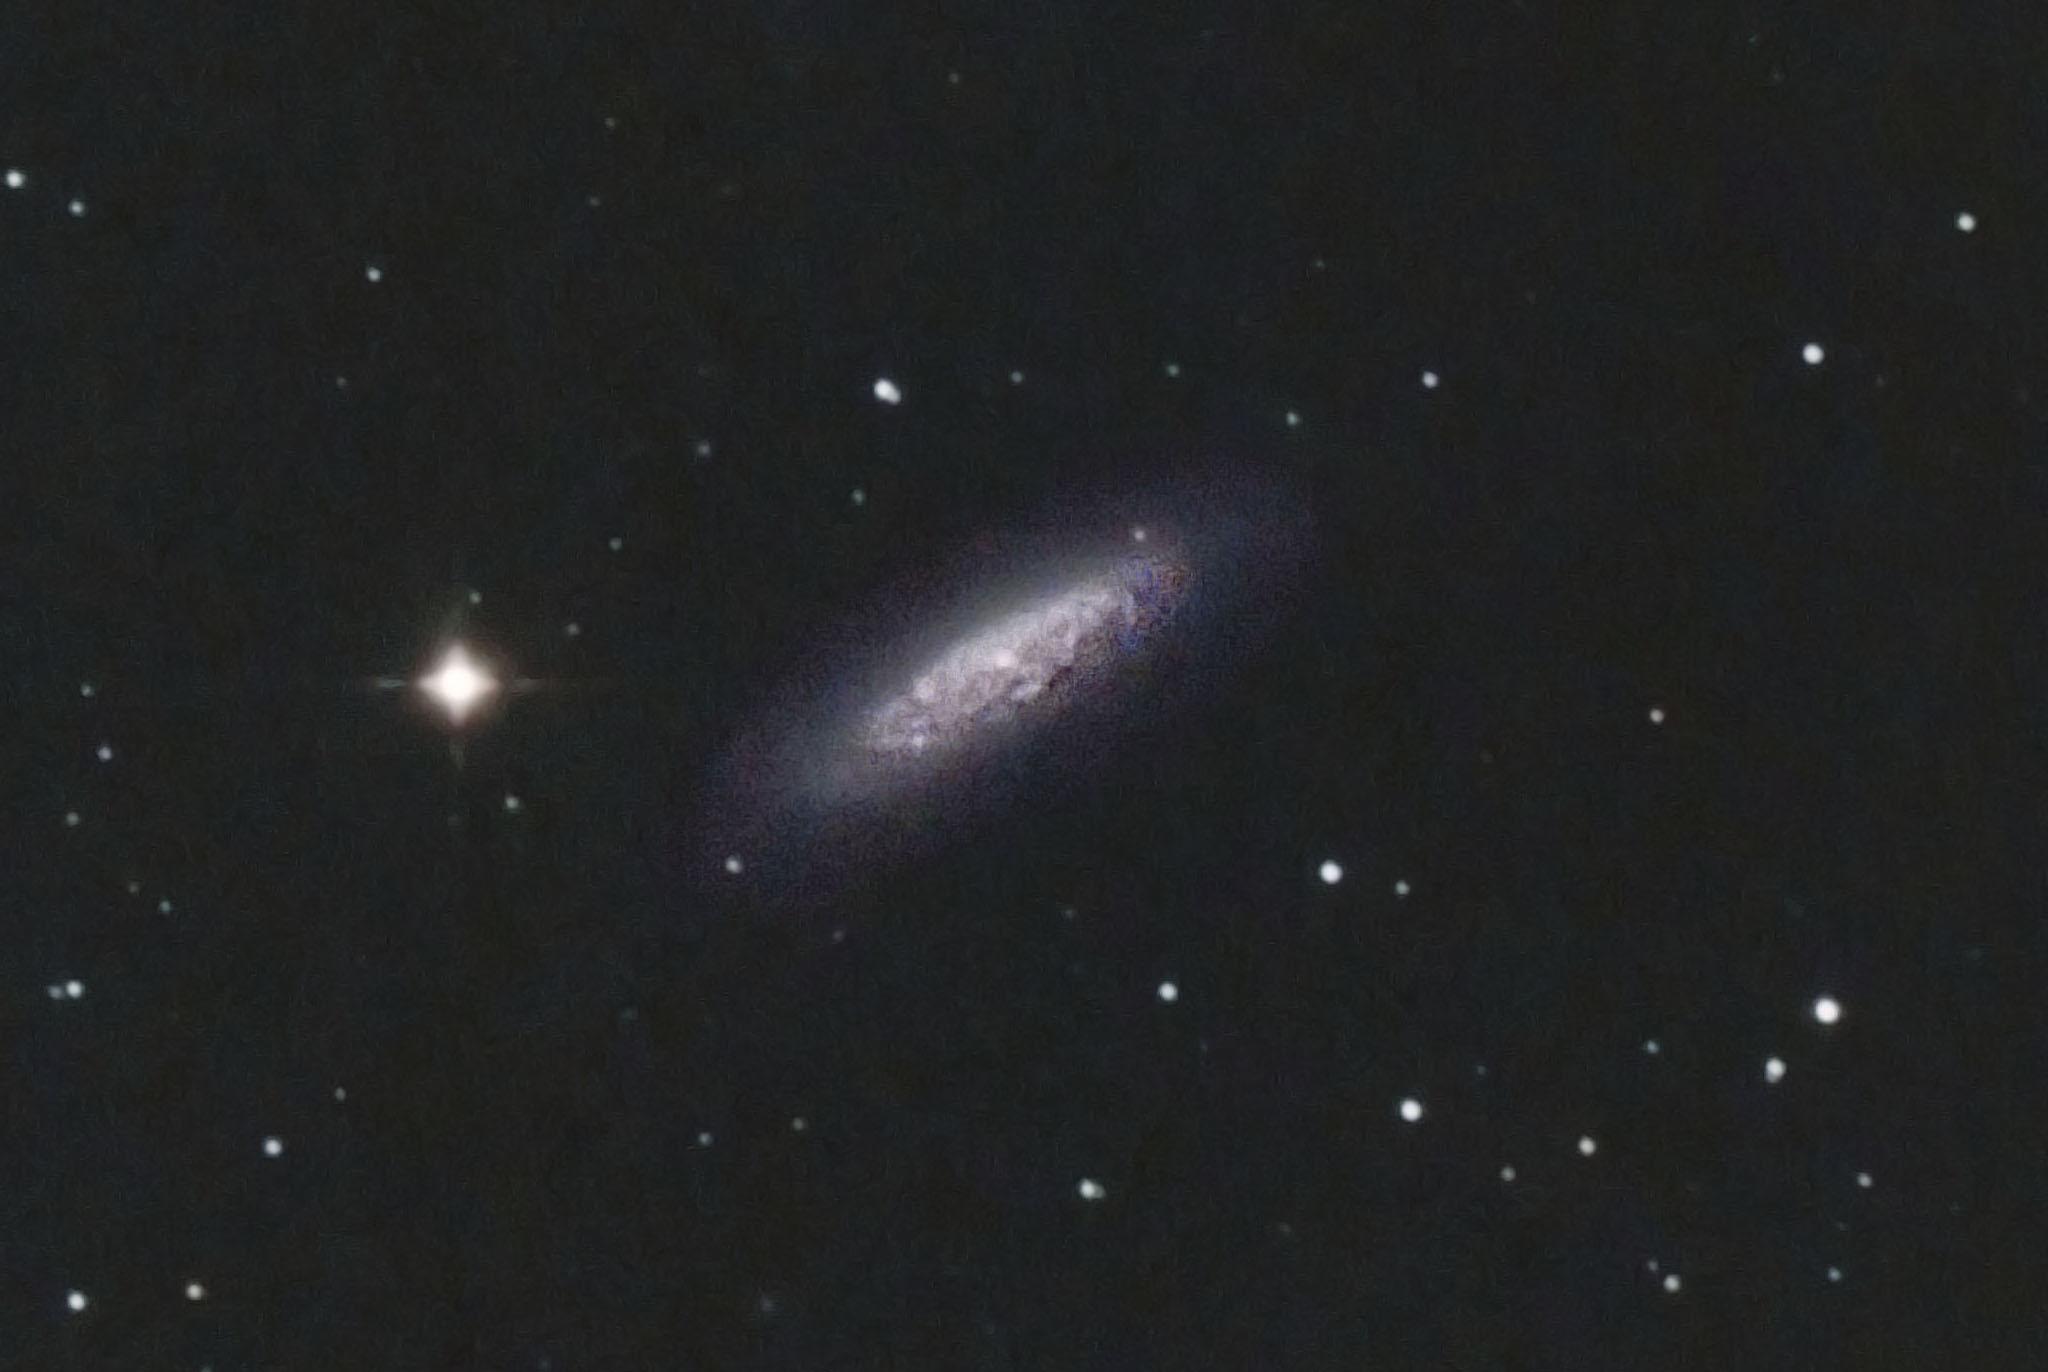 NGC 6503 in Draco